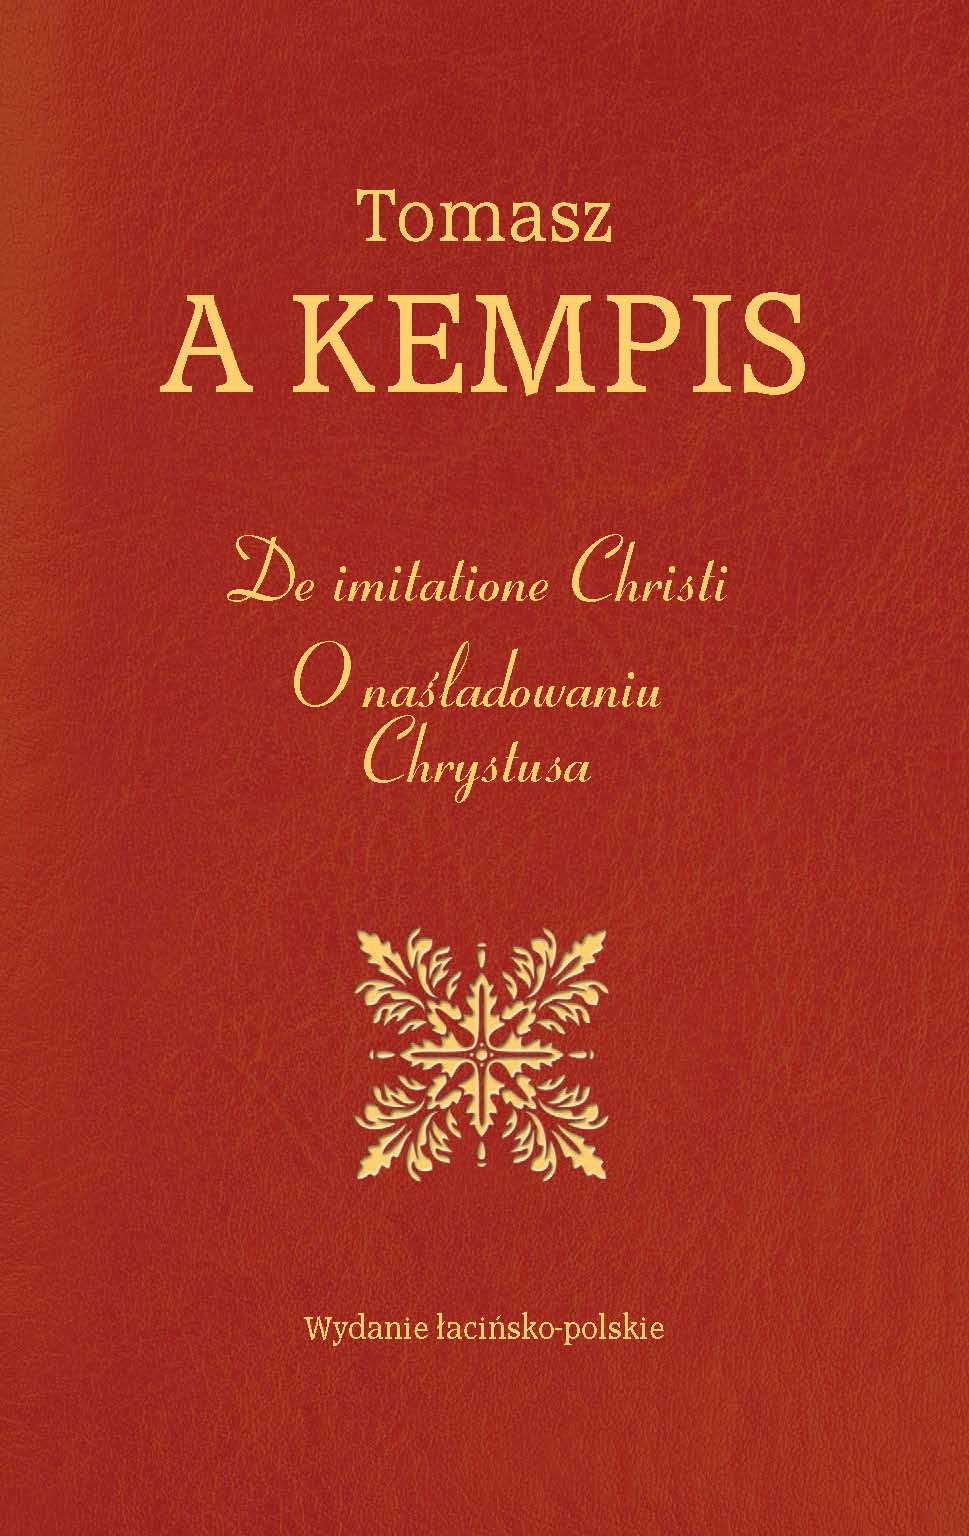 DE IMITATIONE CHRISTI - O NAŚLADOWANIU CHRYSTUSA